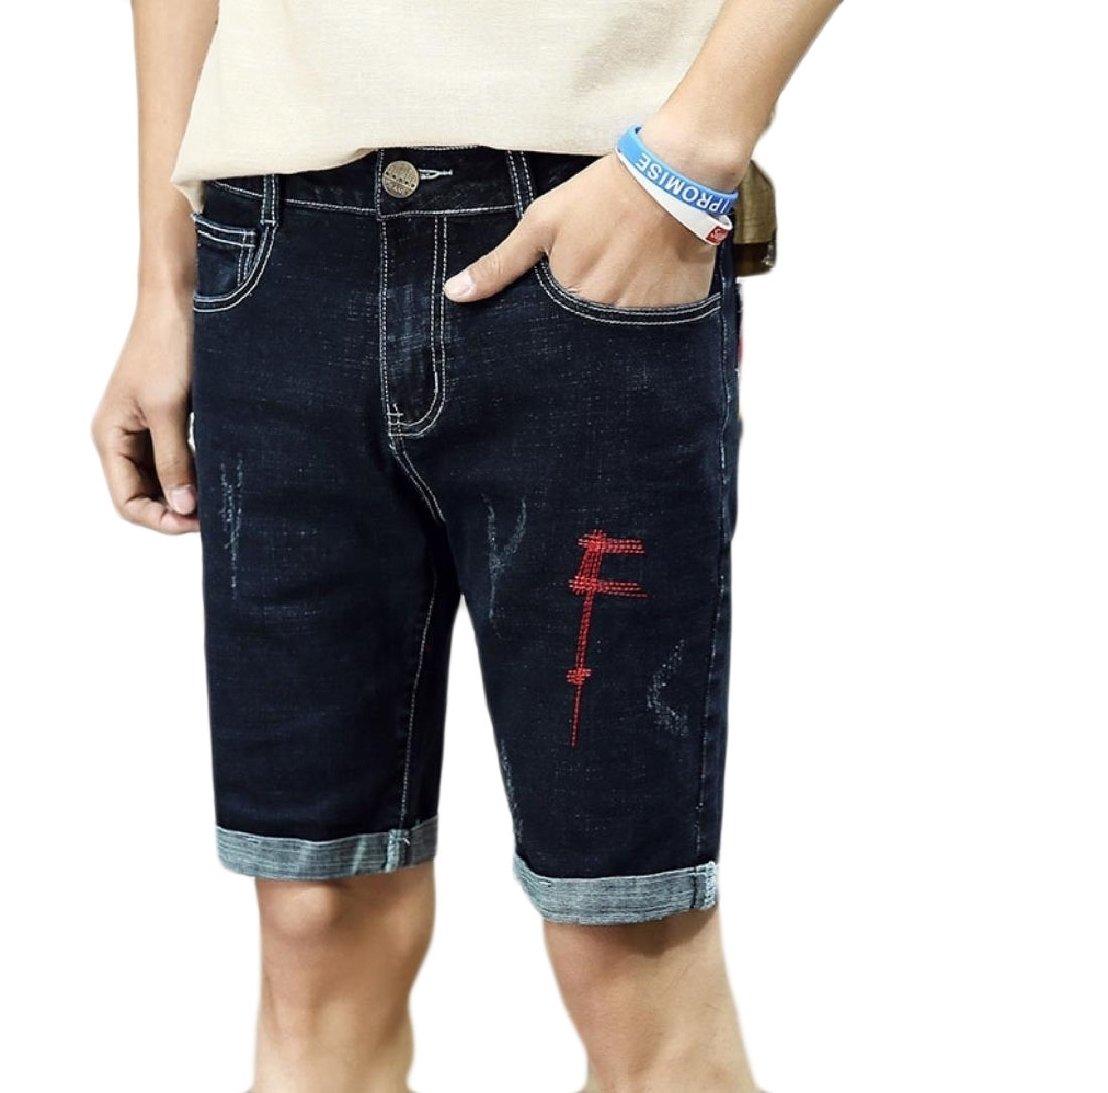 cheelot Men Crimping Simple All-Match Fit Leisure Vogue Denim Shorts Black 36